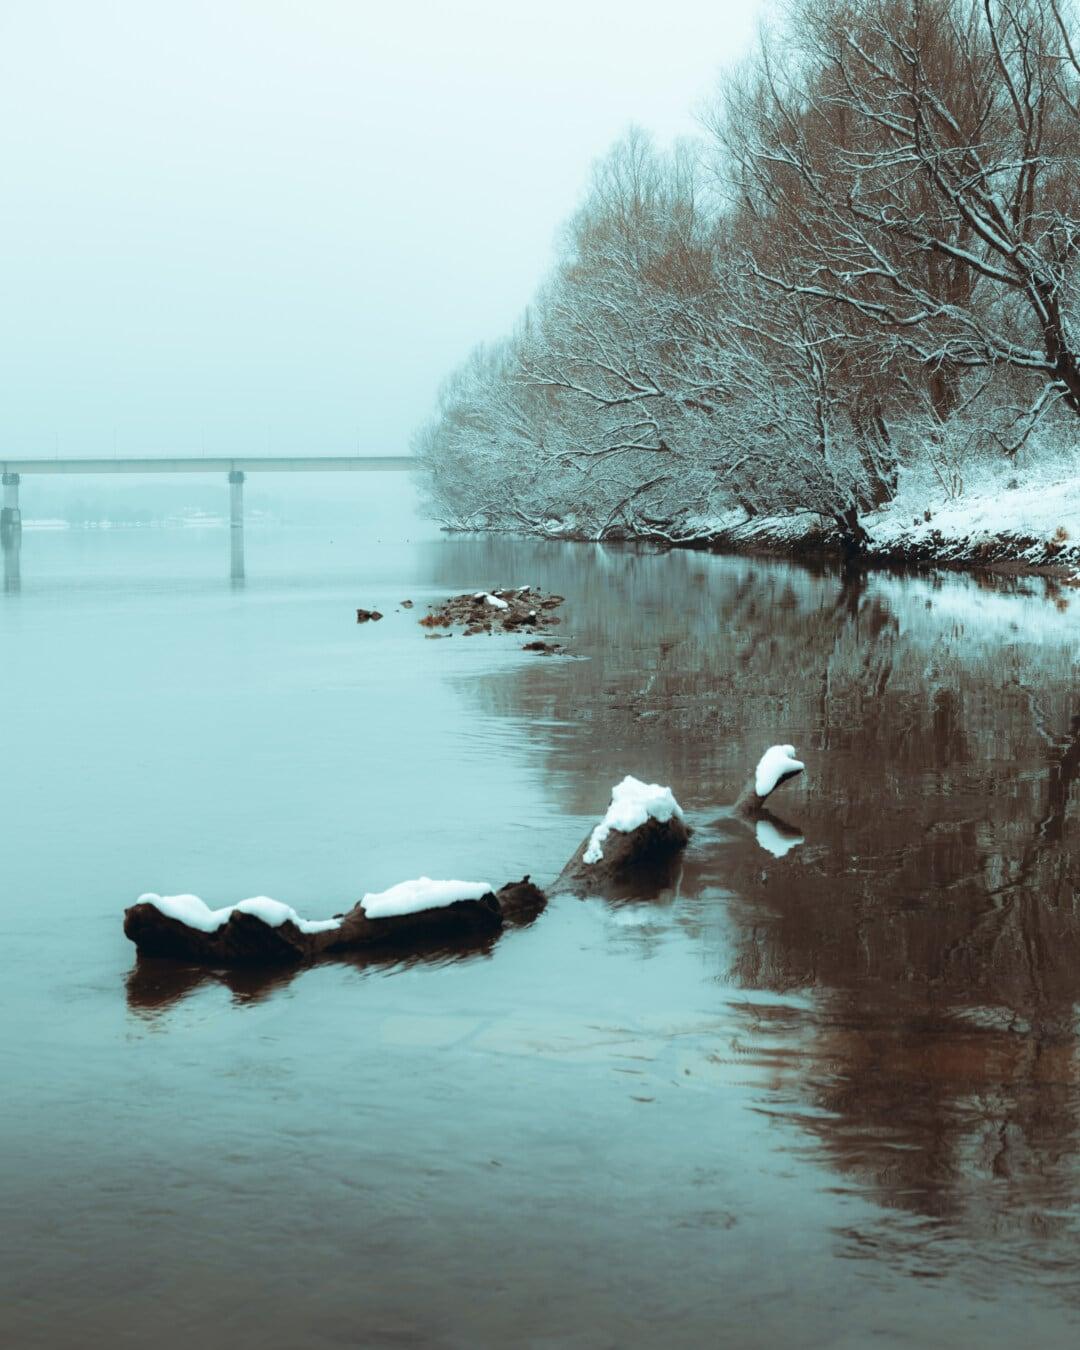 landscape, ice water, snowy, winter, foggy, bridge, beach, snow, water, dawn